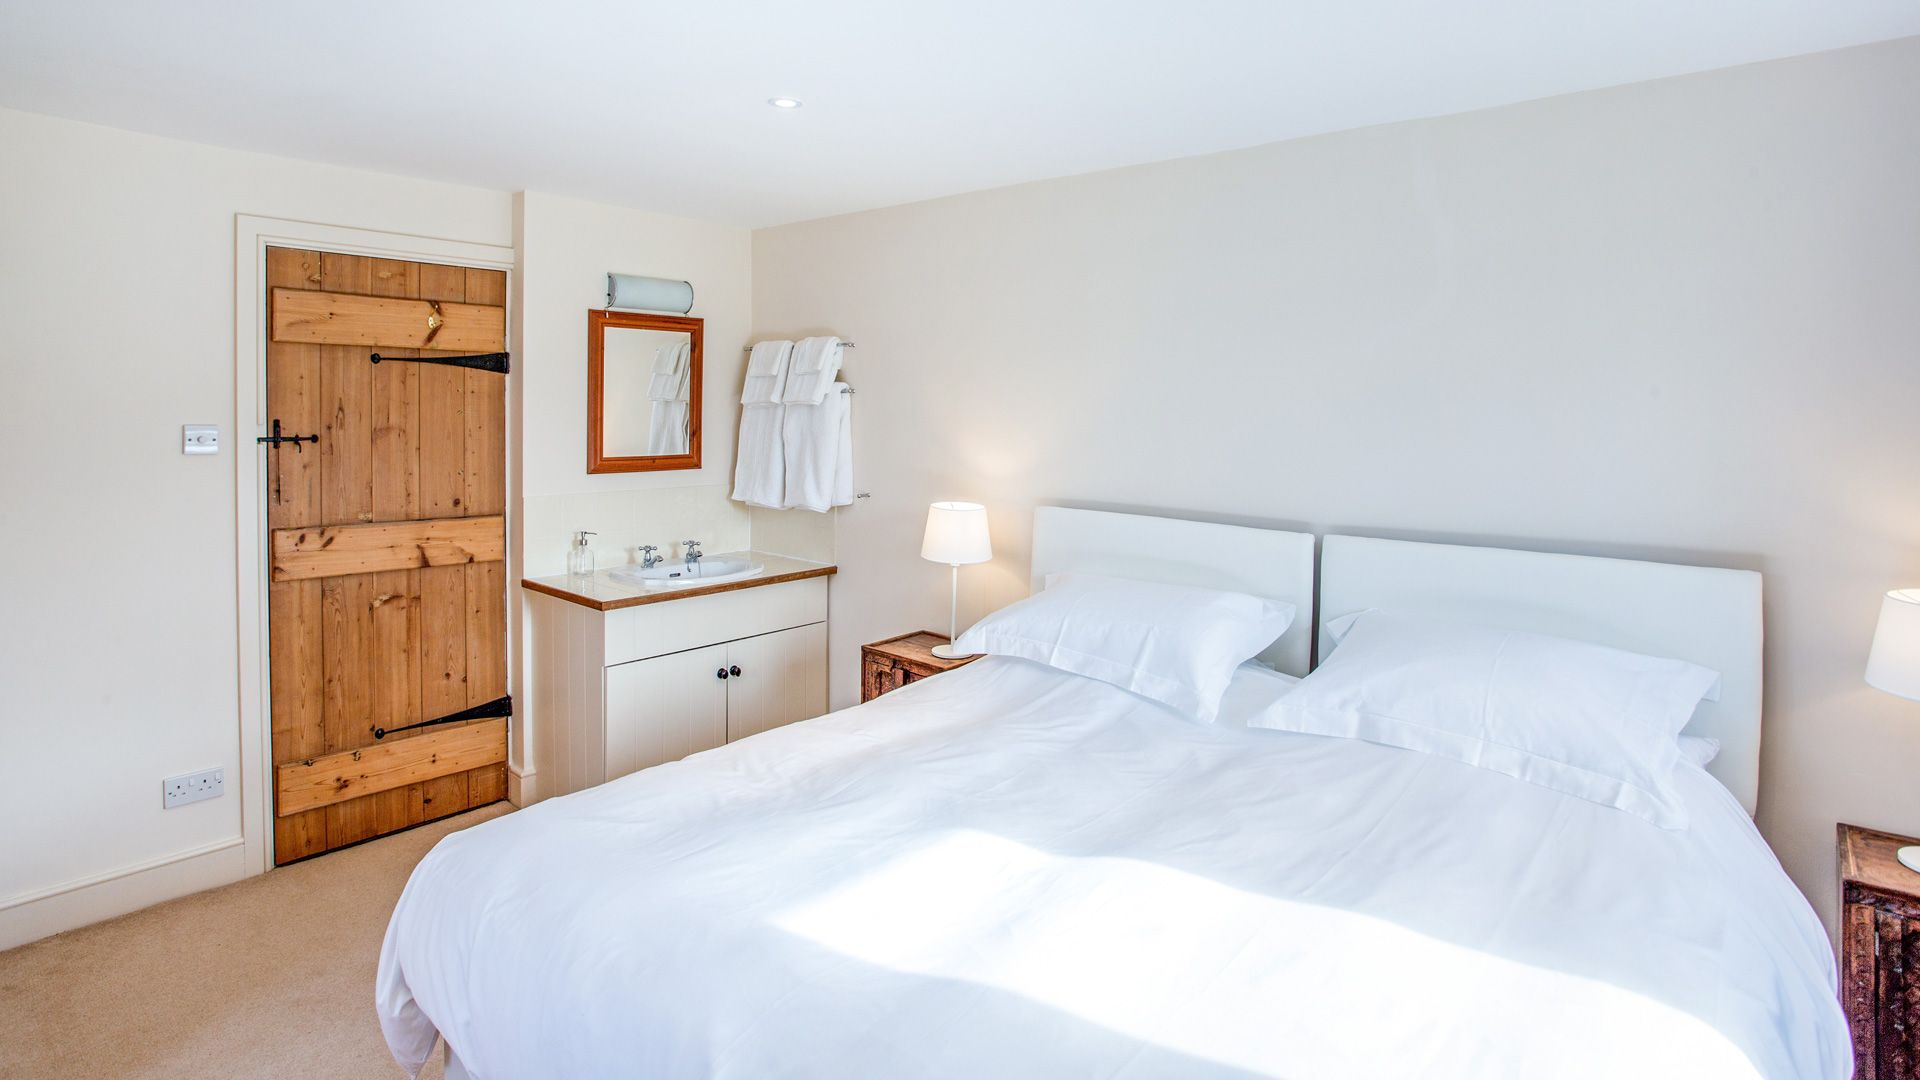 Moonlight Barn Bedroom - StayCotswold